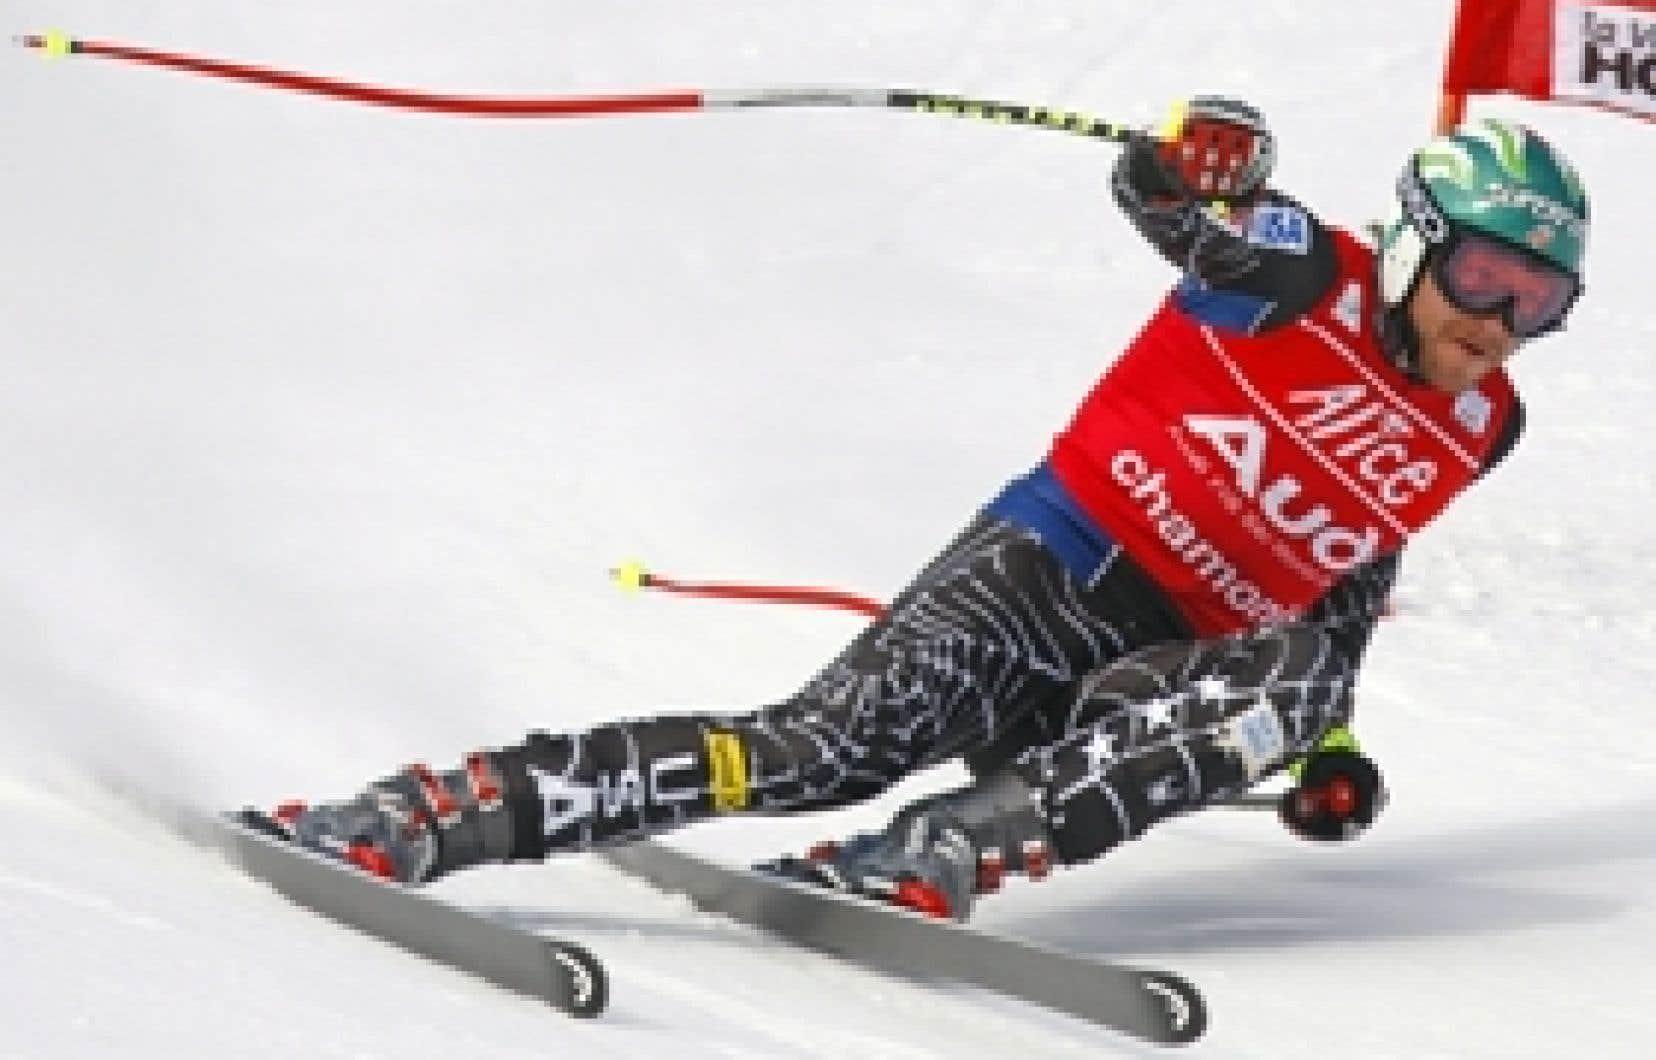 Coupe du monde de ski alpin bode miller en t te du - Classement coupe du monde de ski alpin ...